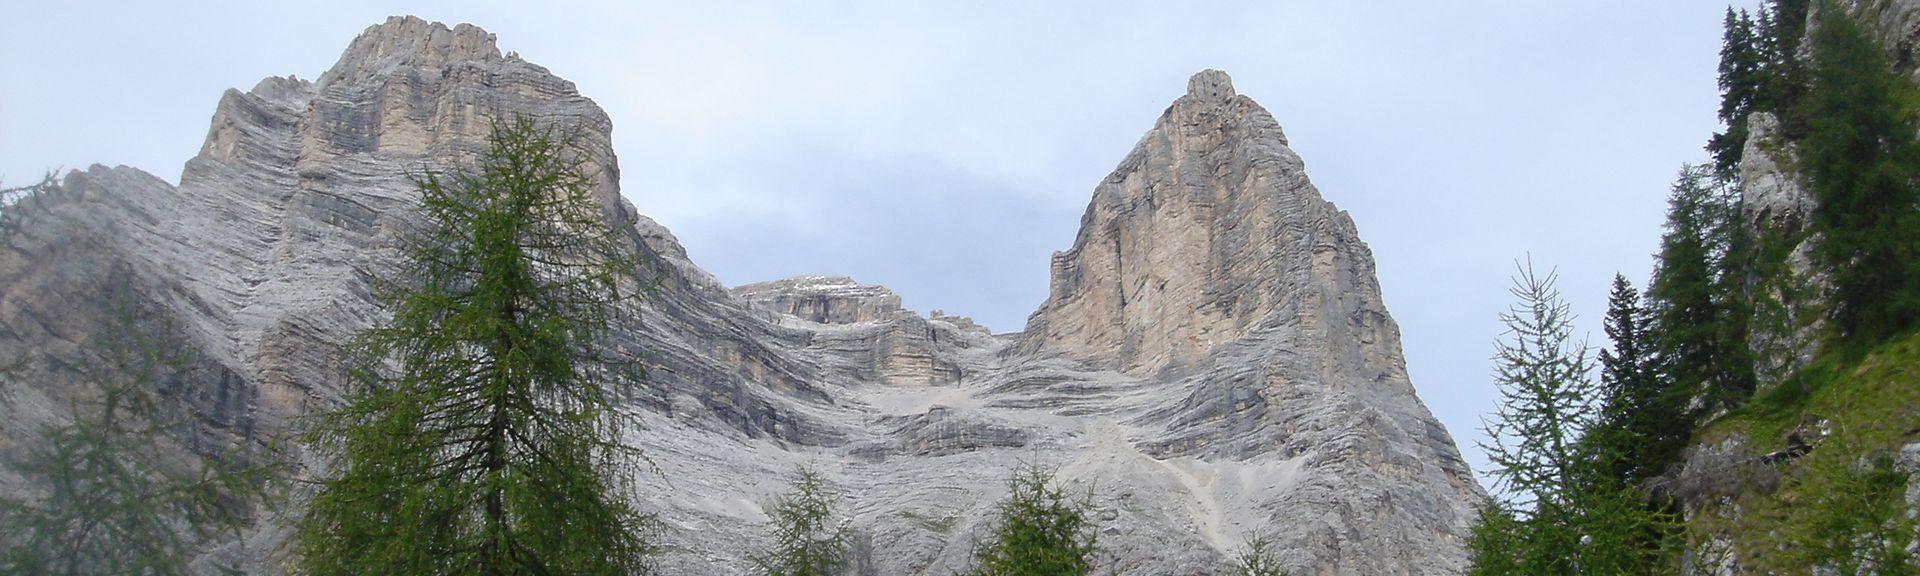 Valle, Province of Belluno, Veneto, Italy